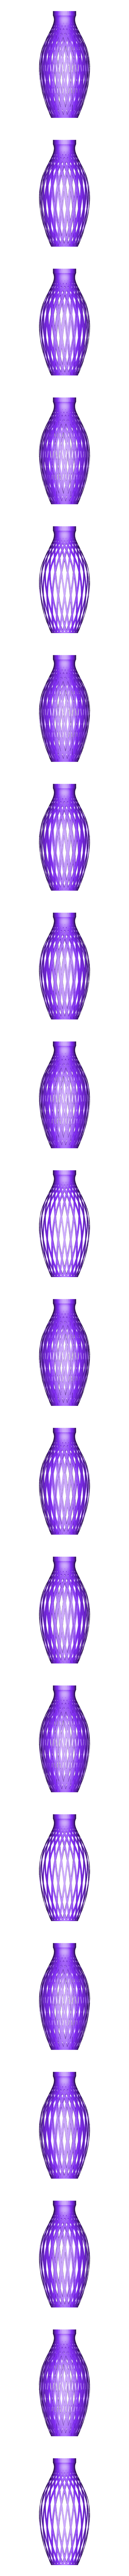 Douwe2.STL Download free STL file Design lamp shade • Design to 3D print, MaterialsToBuils3D